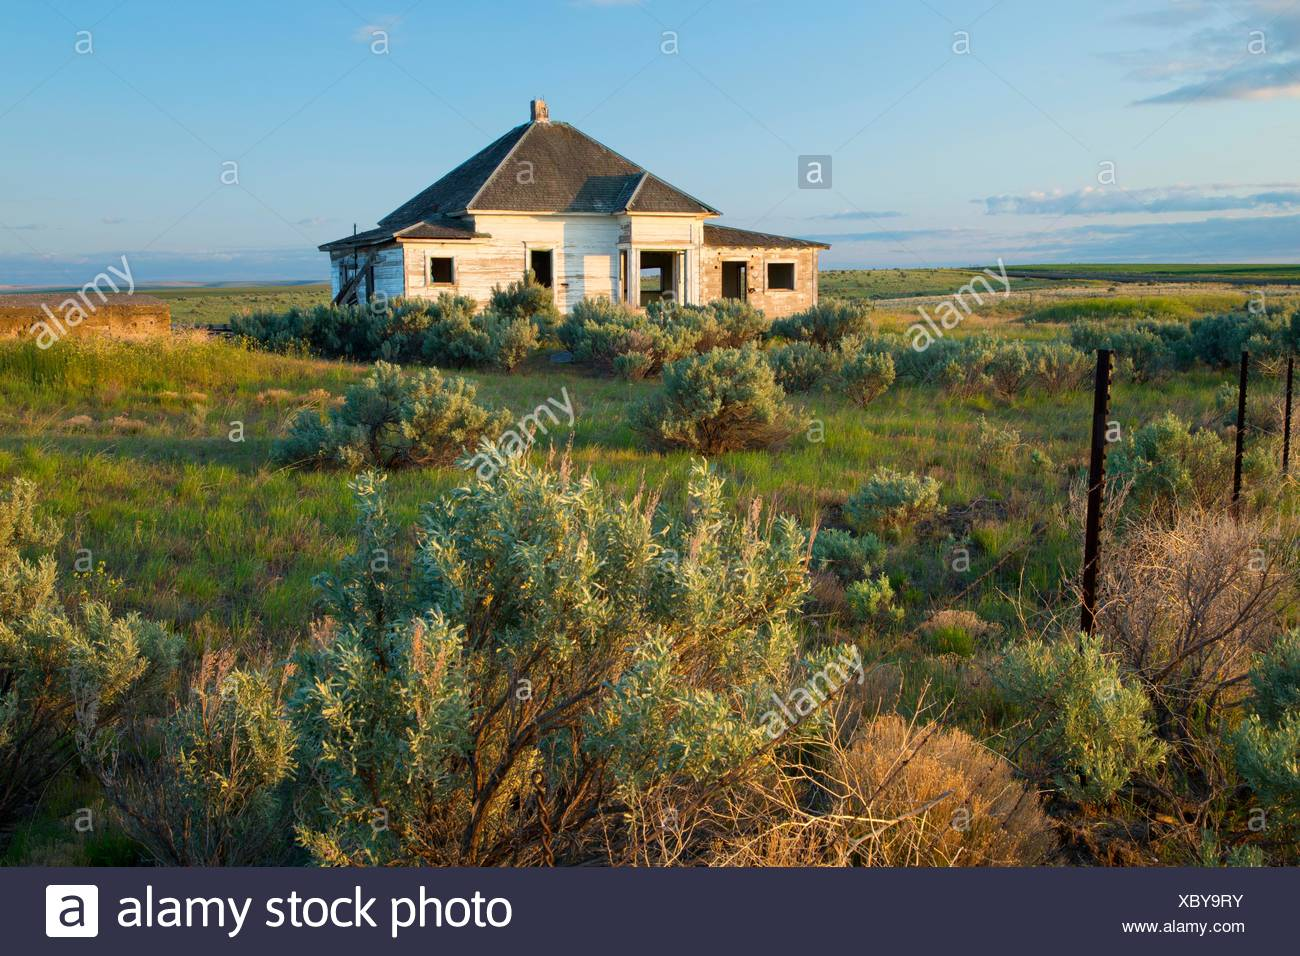 Abandoned homestead, Gilliam County, Oregon. - Stock Image